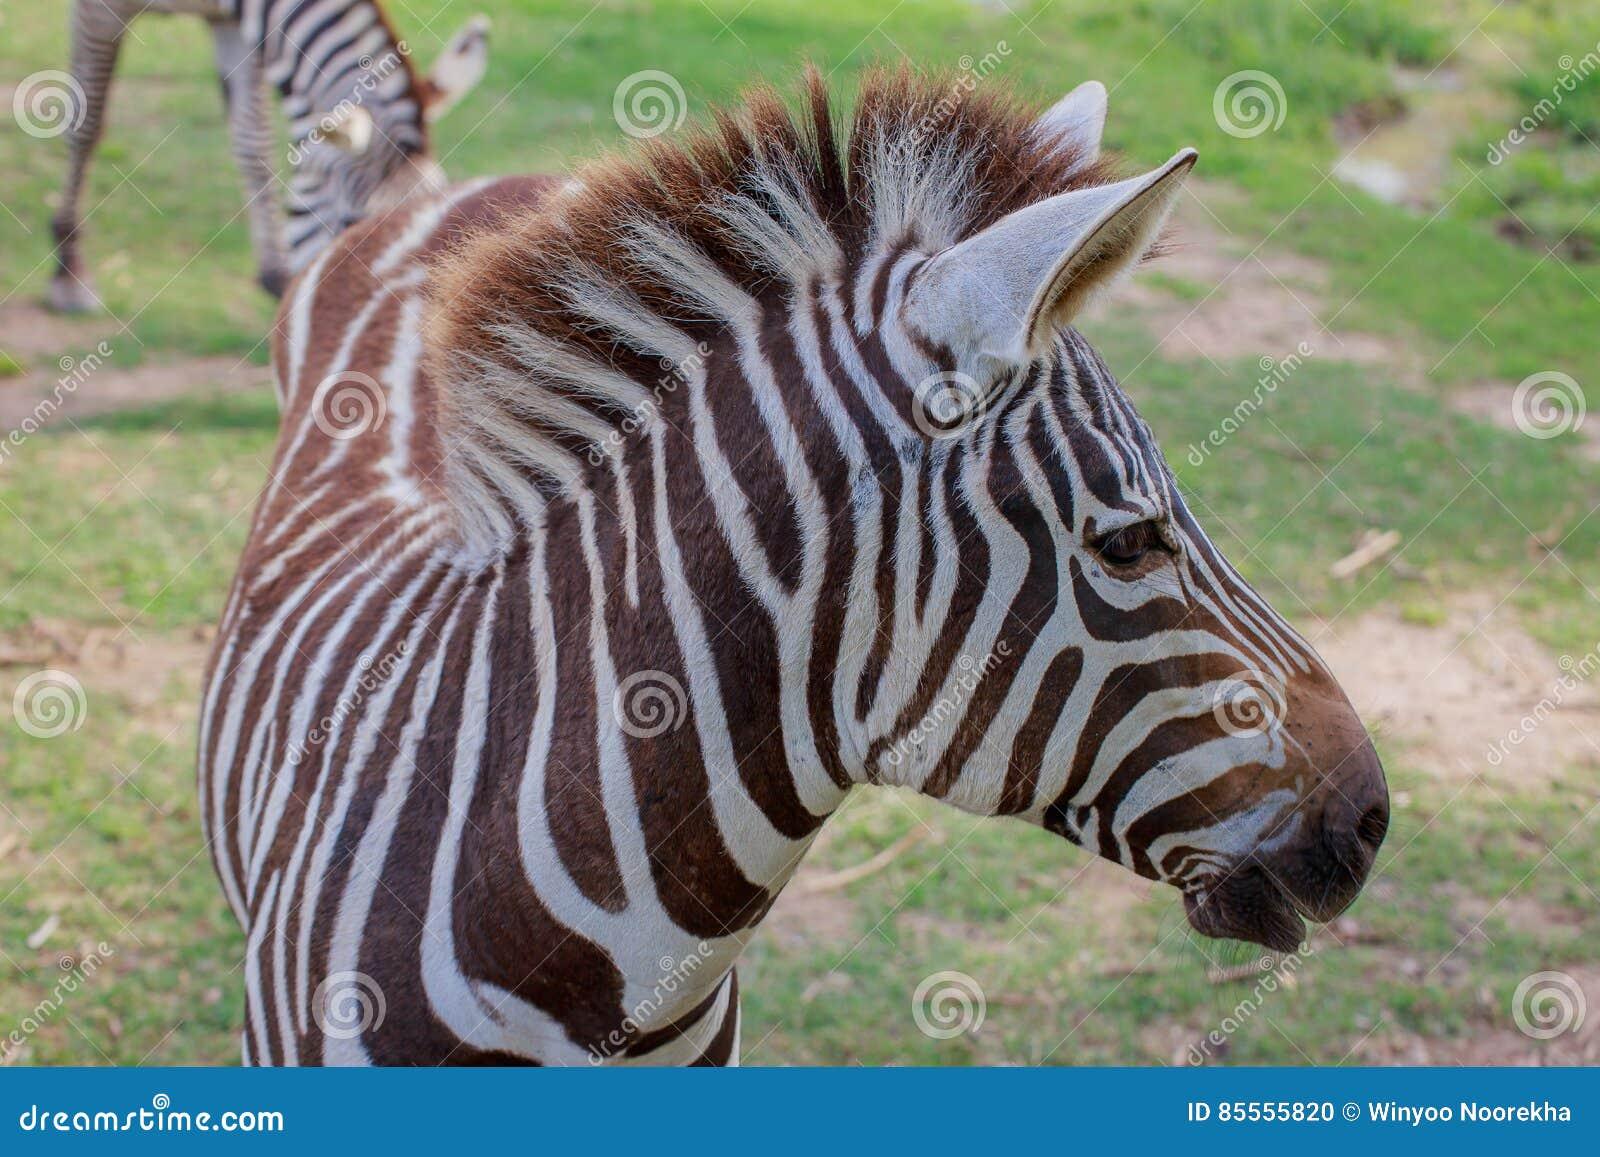 Kopf von Zebra